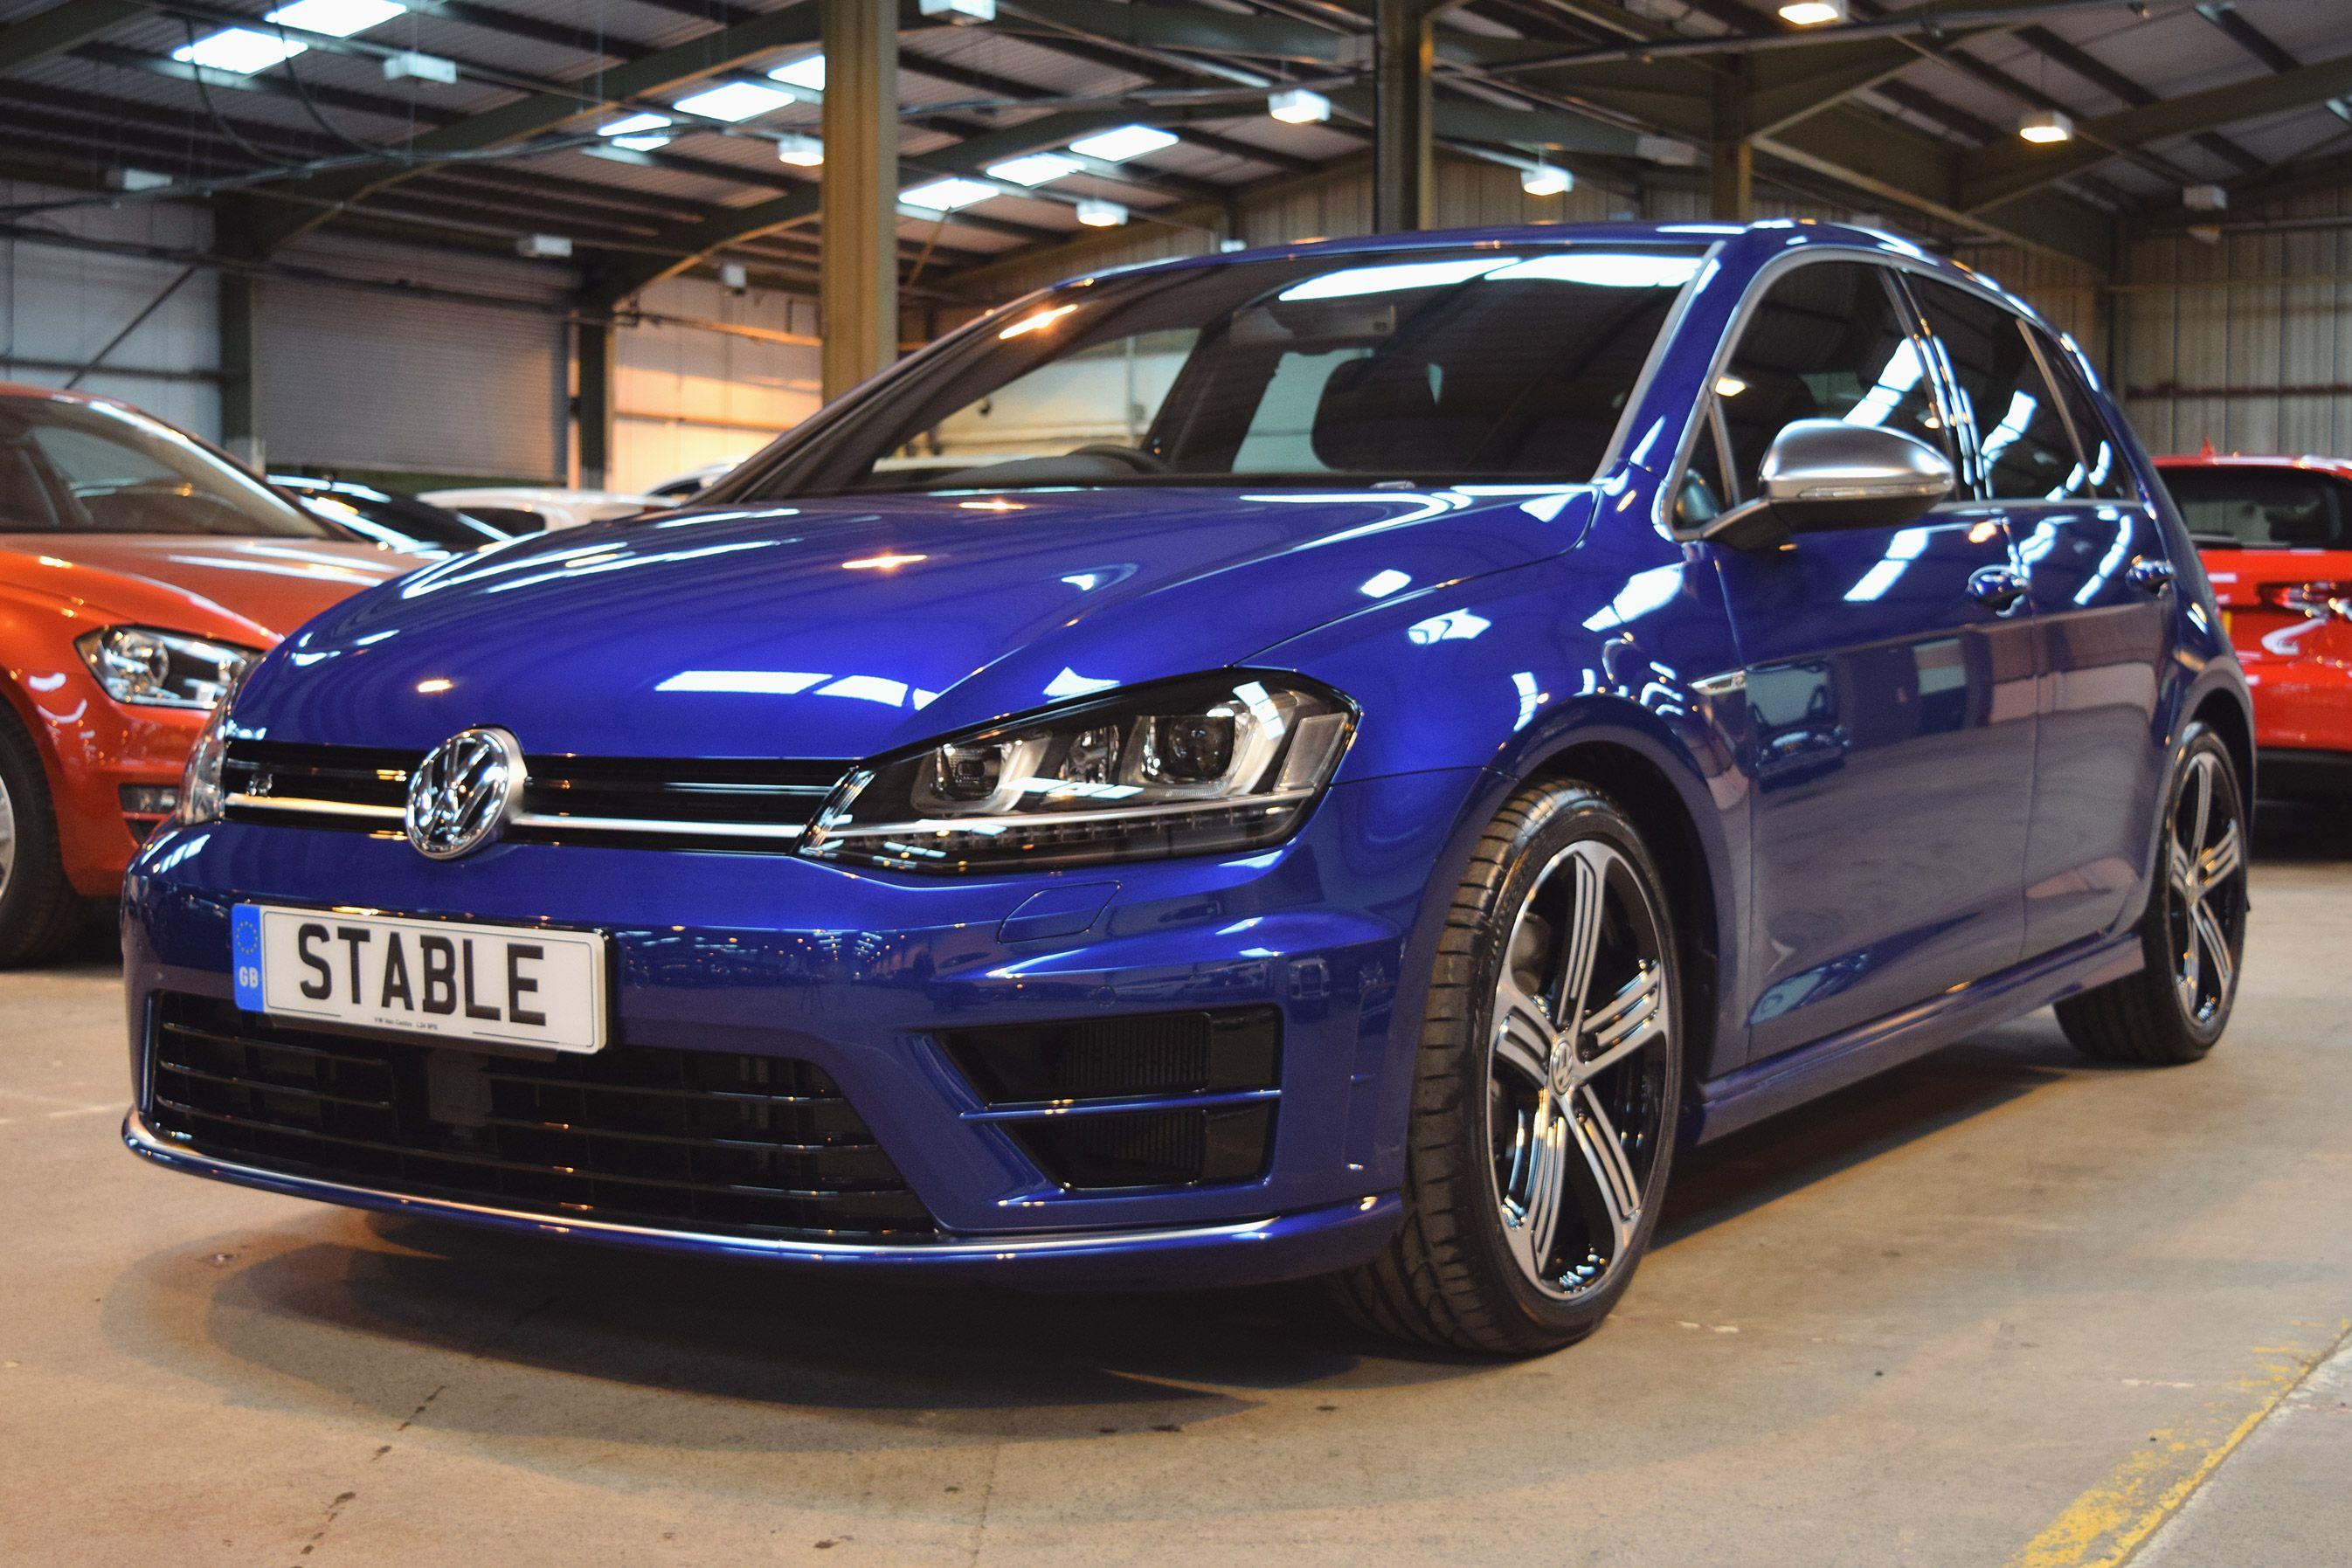 2016 Volkswagen Golf R In Lapiz Blue Volkswagen Golf R